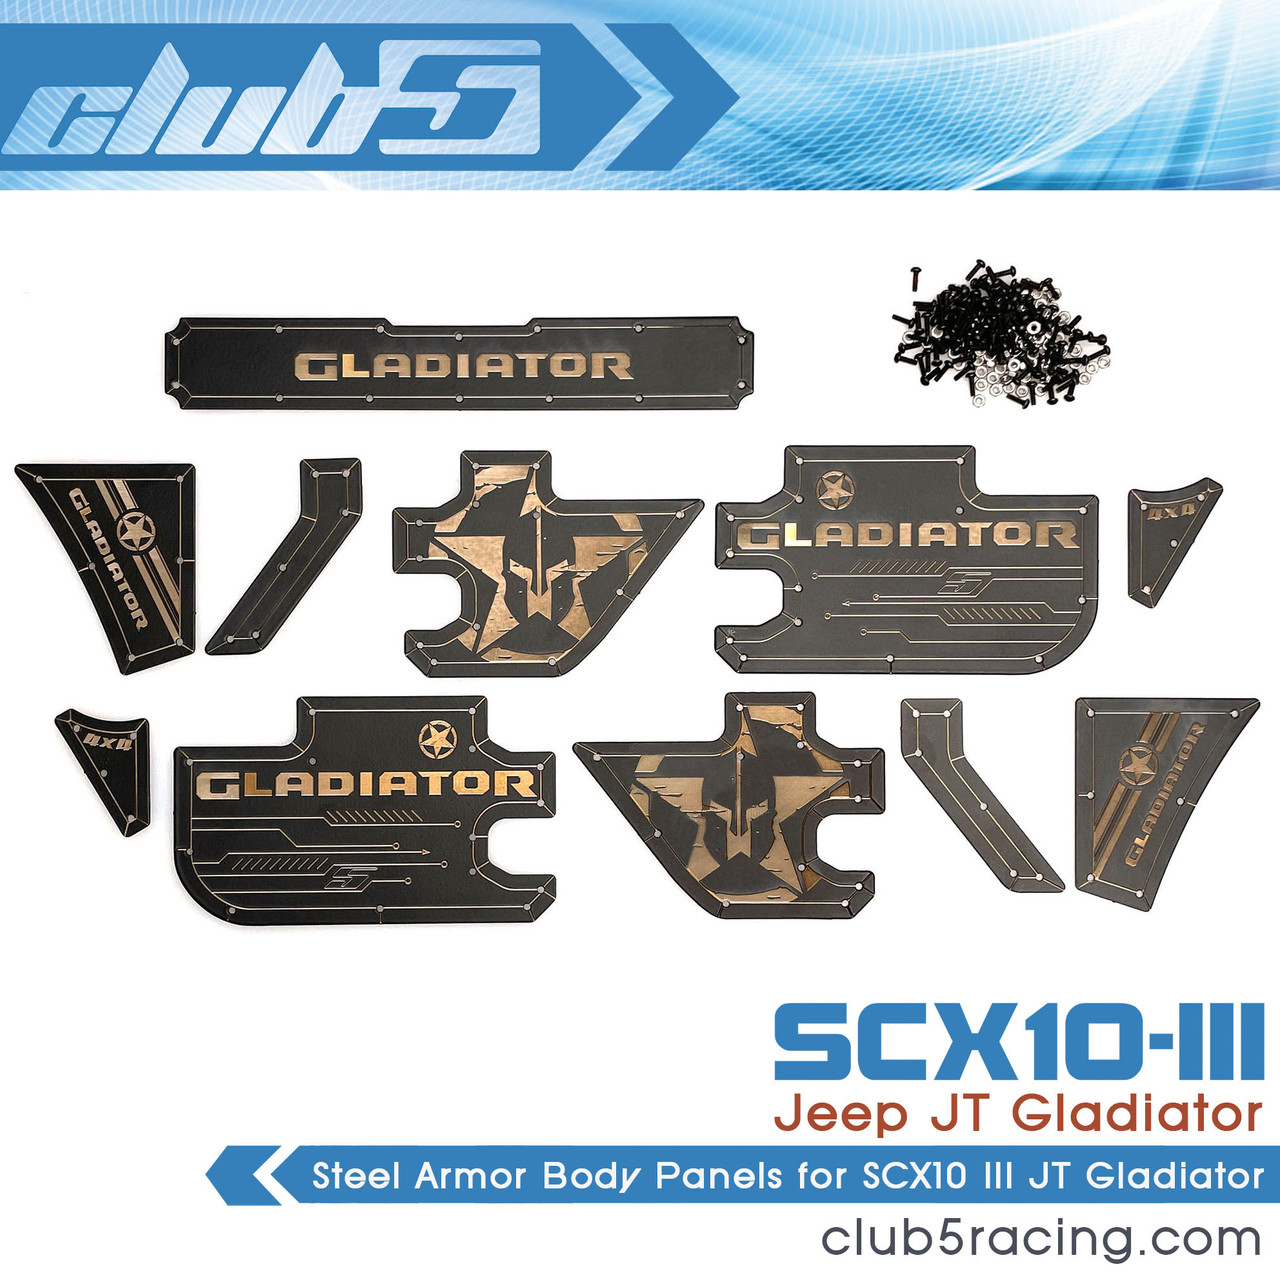 Steel Armor Body Panels for SCX10 III JT Gladiator ( 11 Pcs )